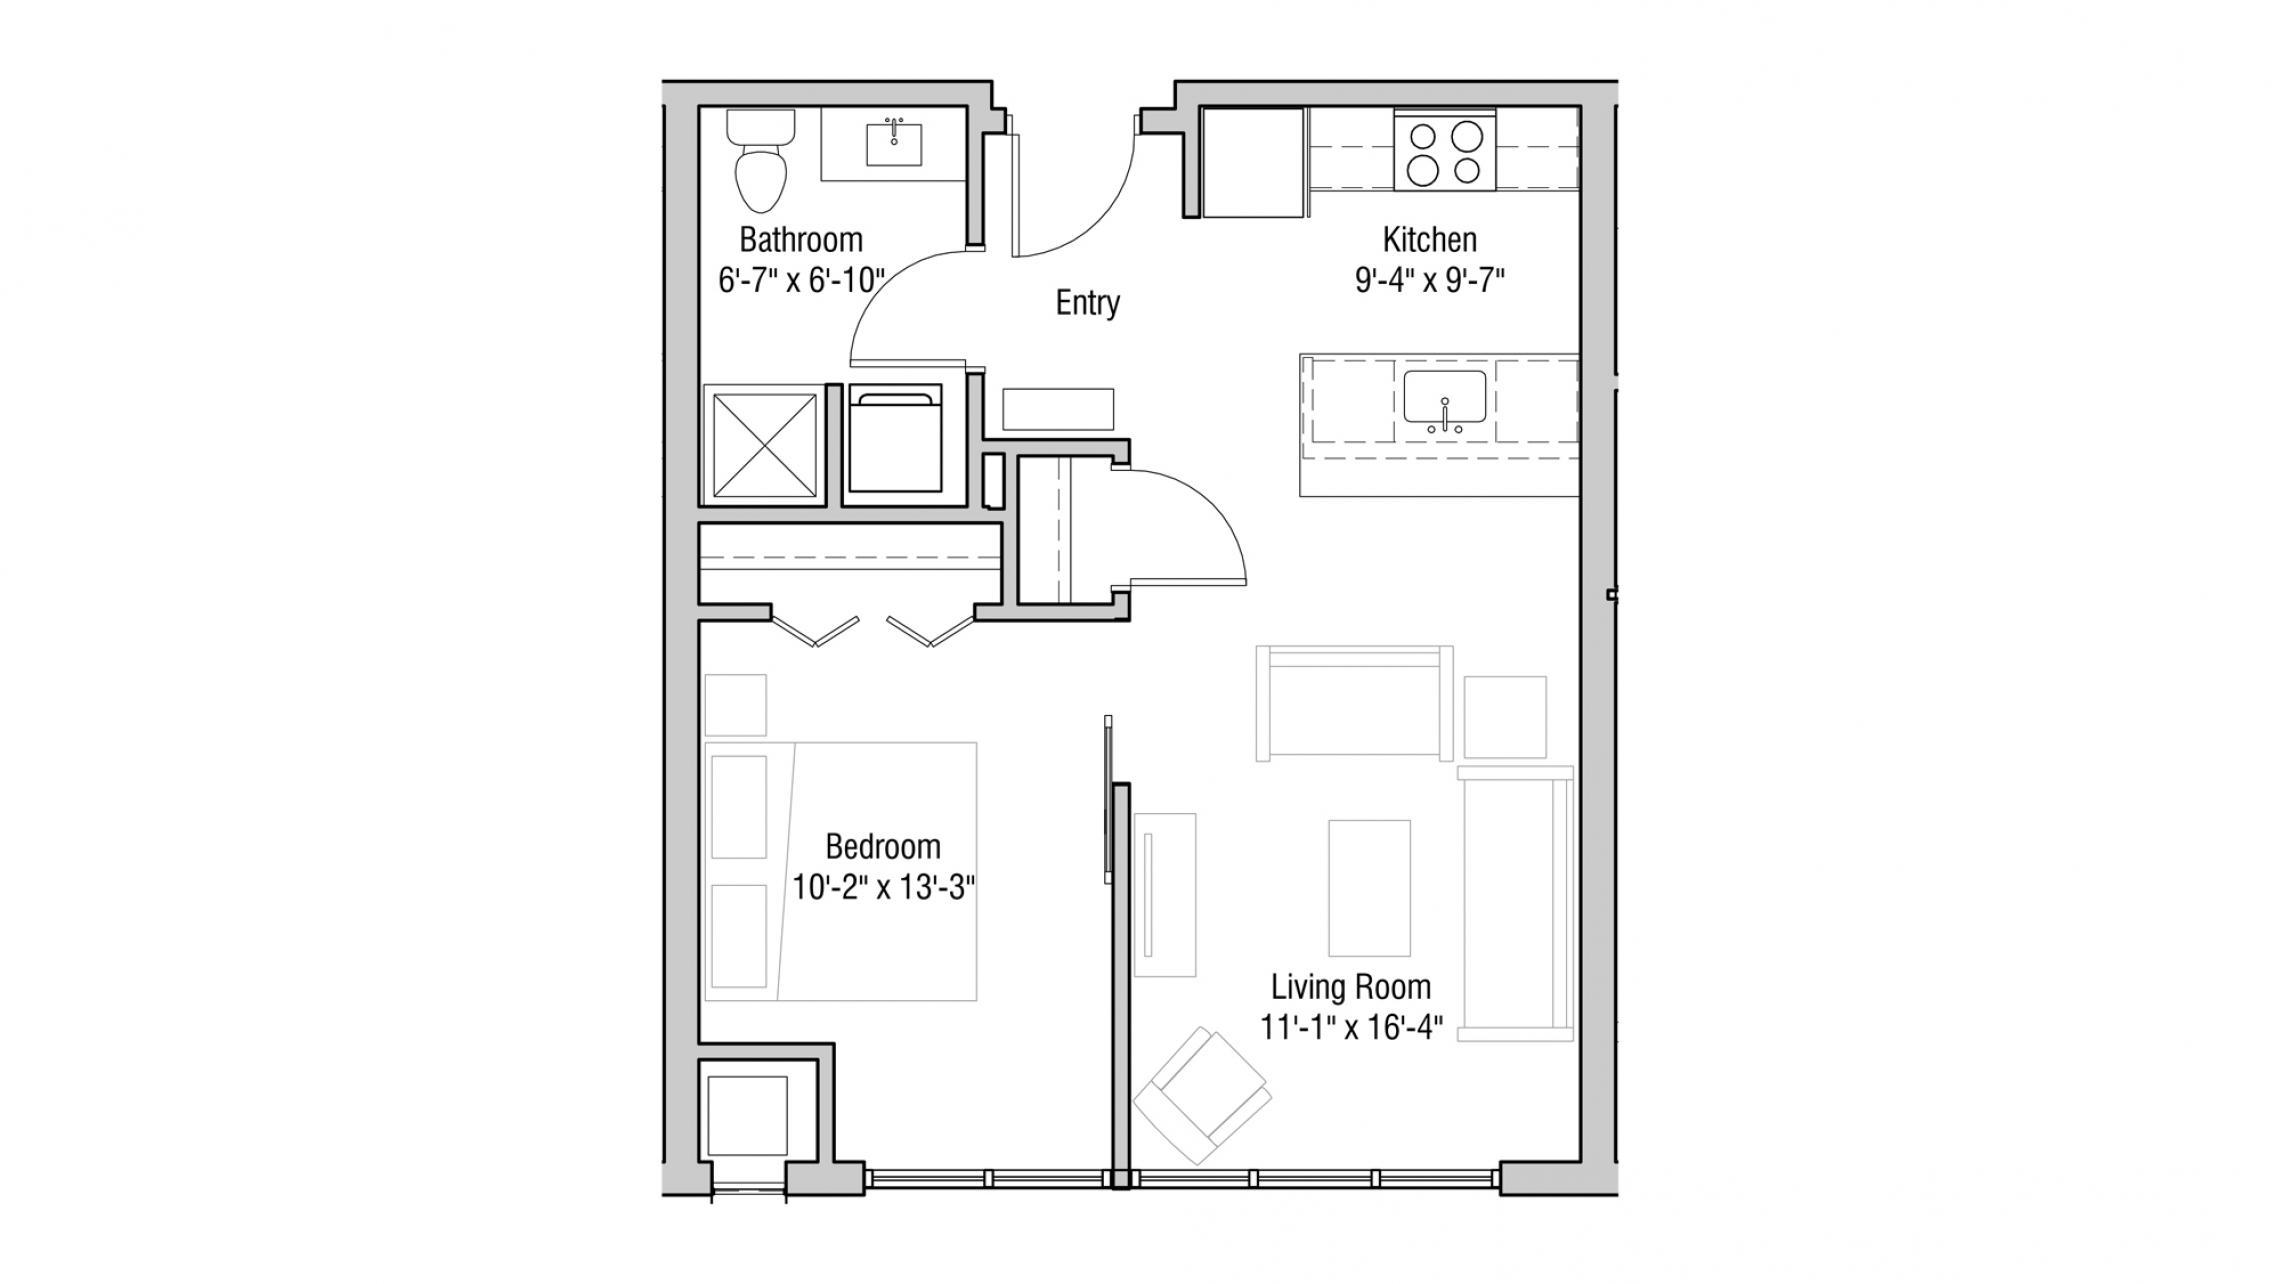 ULI Quarter Row 420 - One Bedroom,  One Bathroom